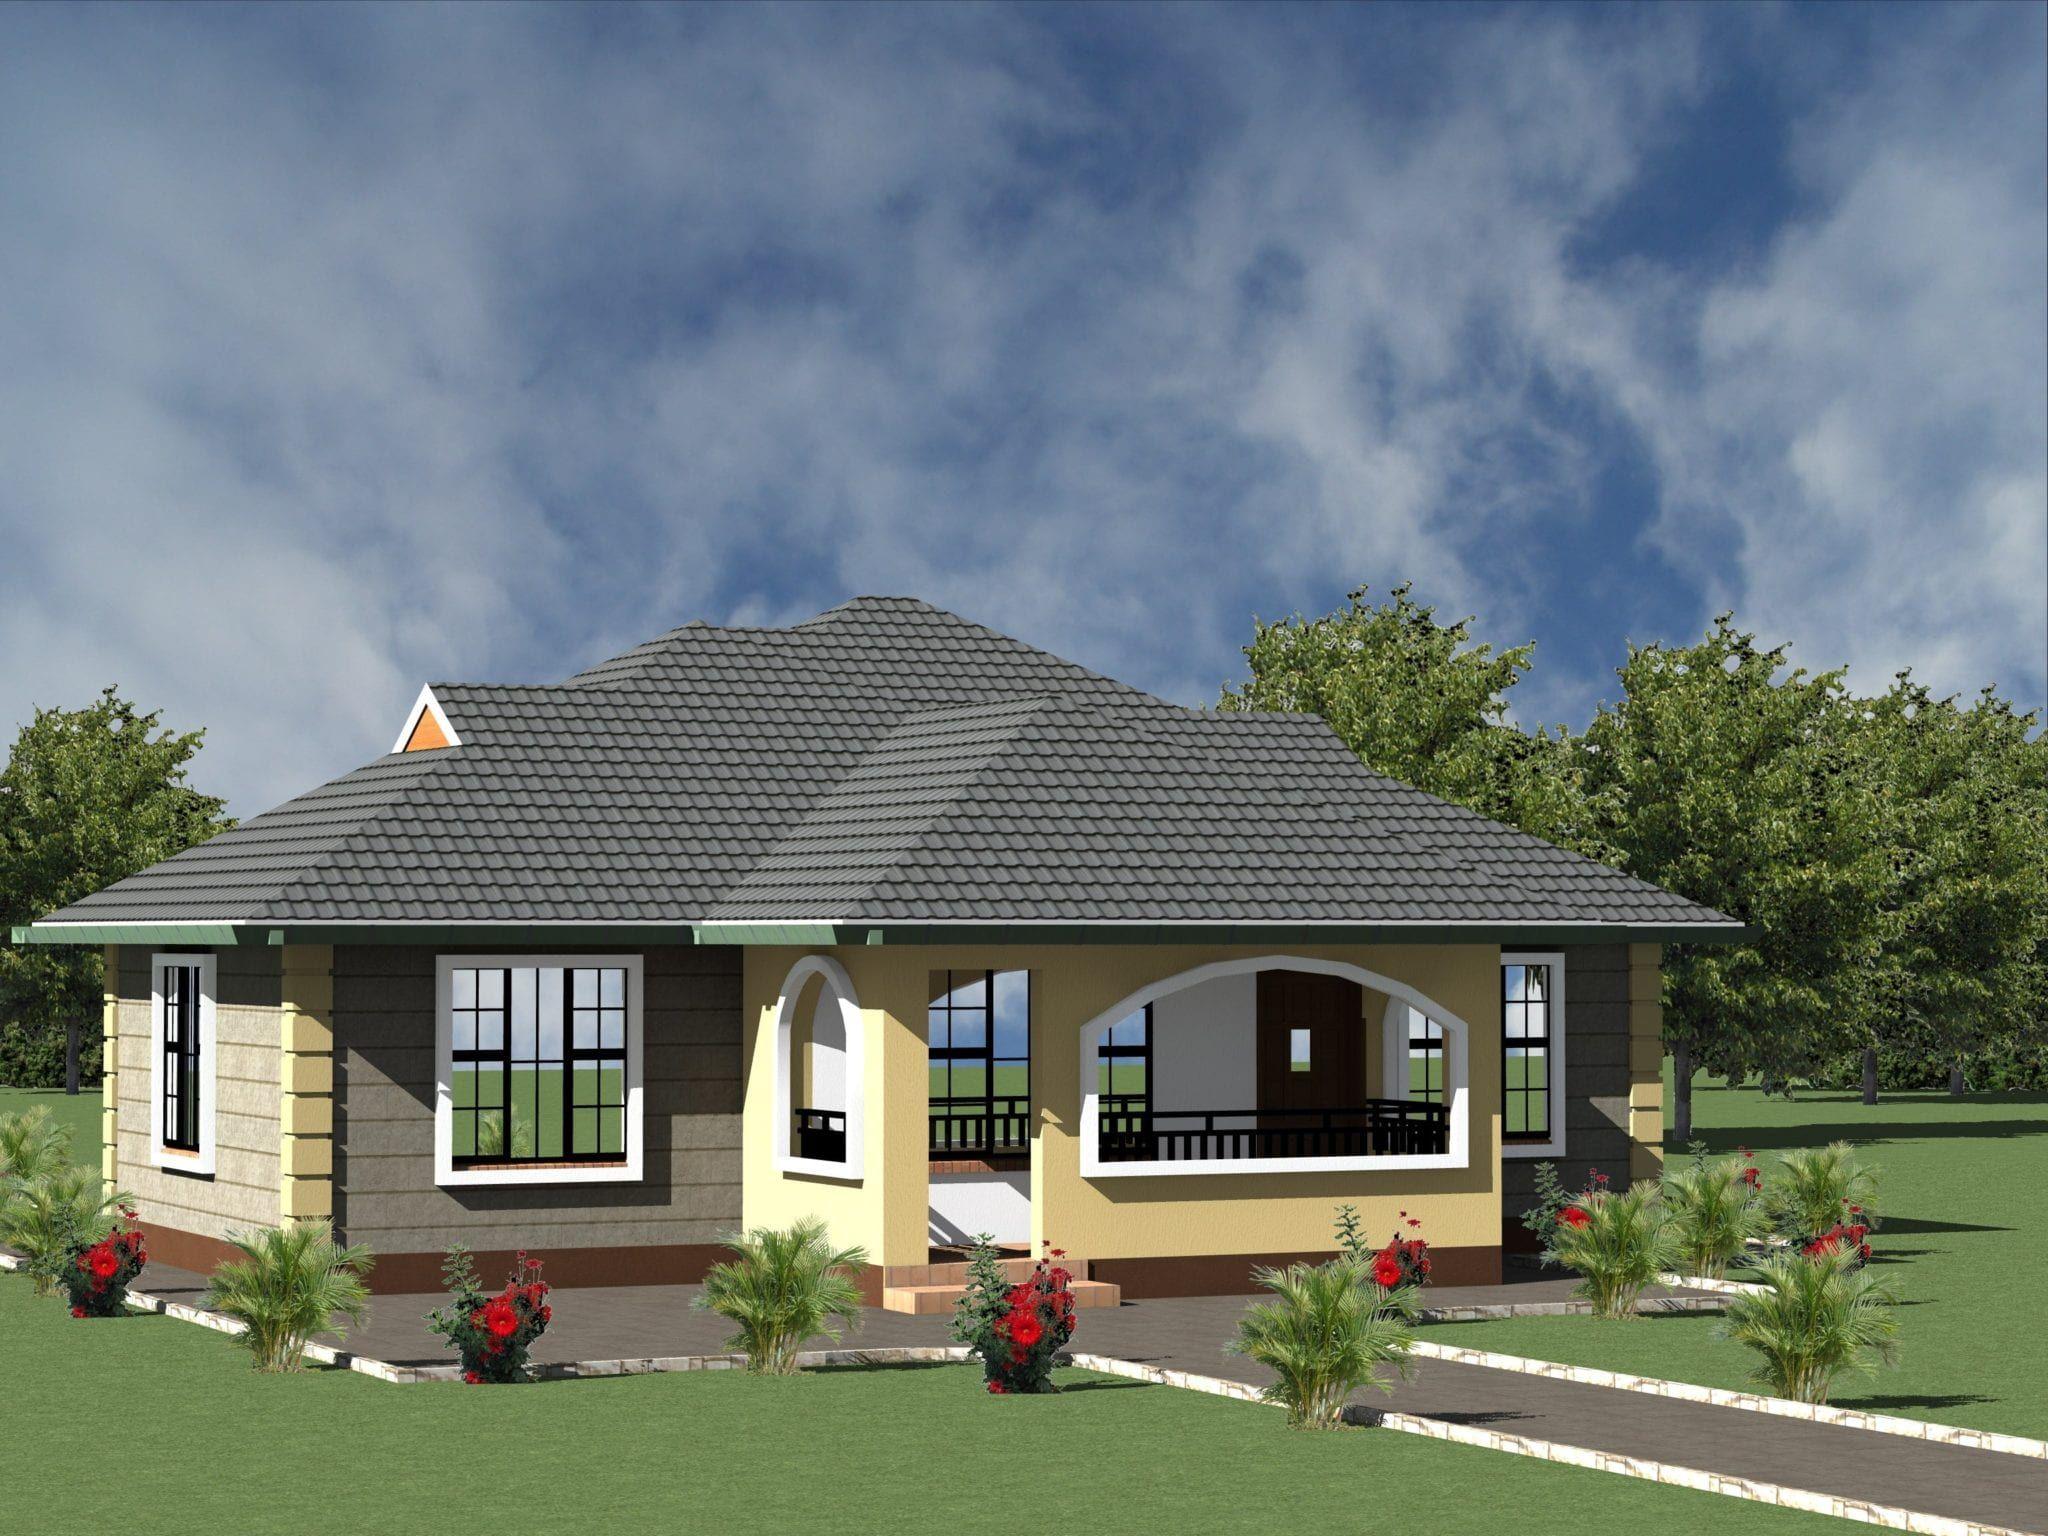 Best House Plans In Kenya In 2020 Cool House Designs Best House Plans House Design